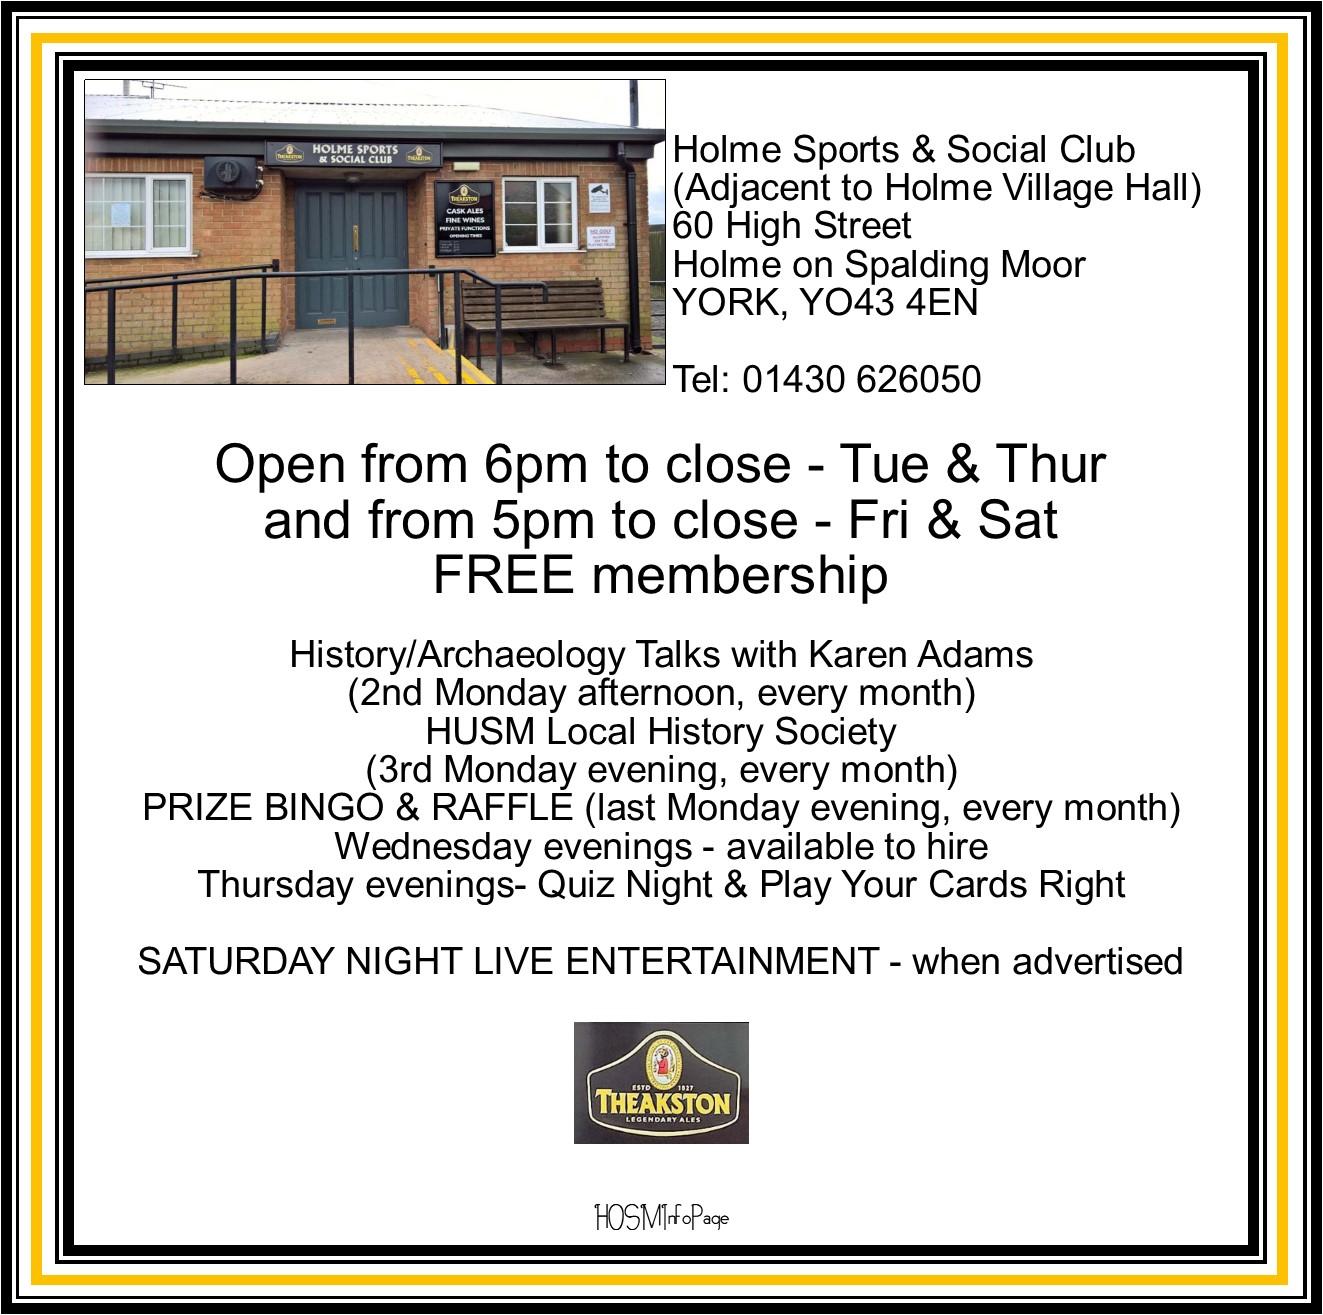 Holme Sports & Social Club